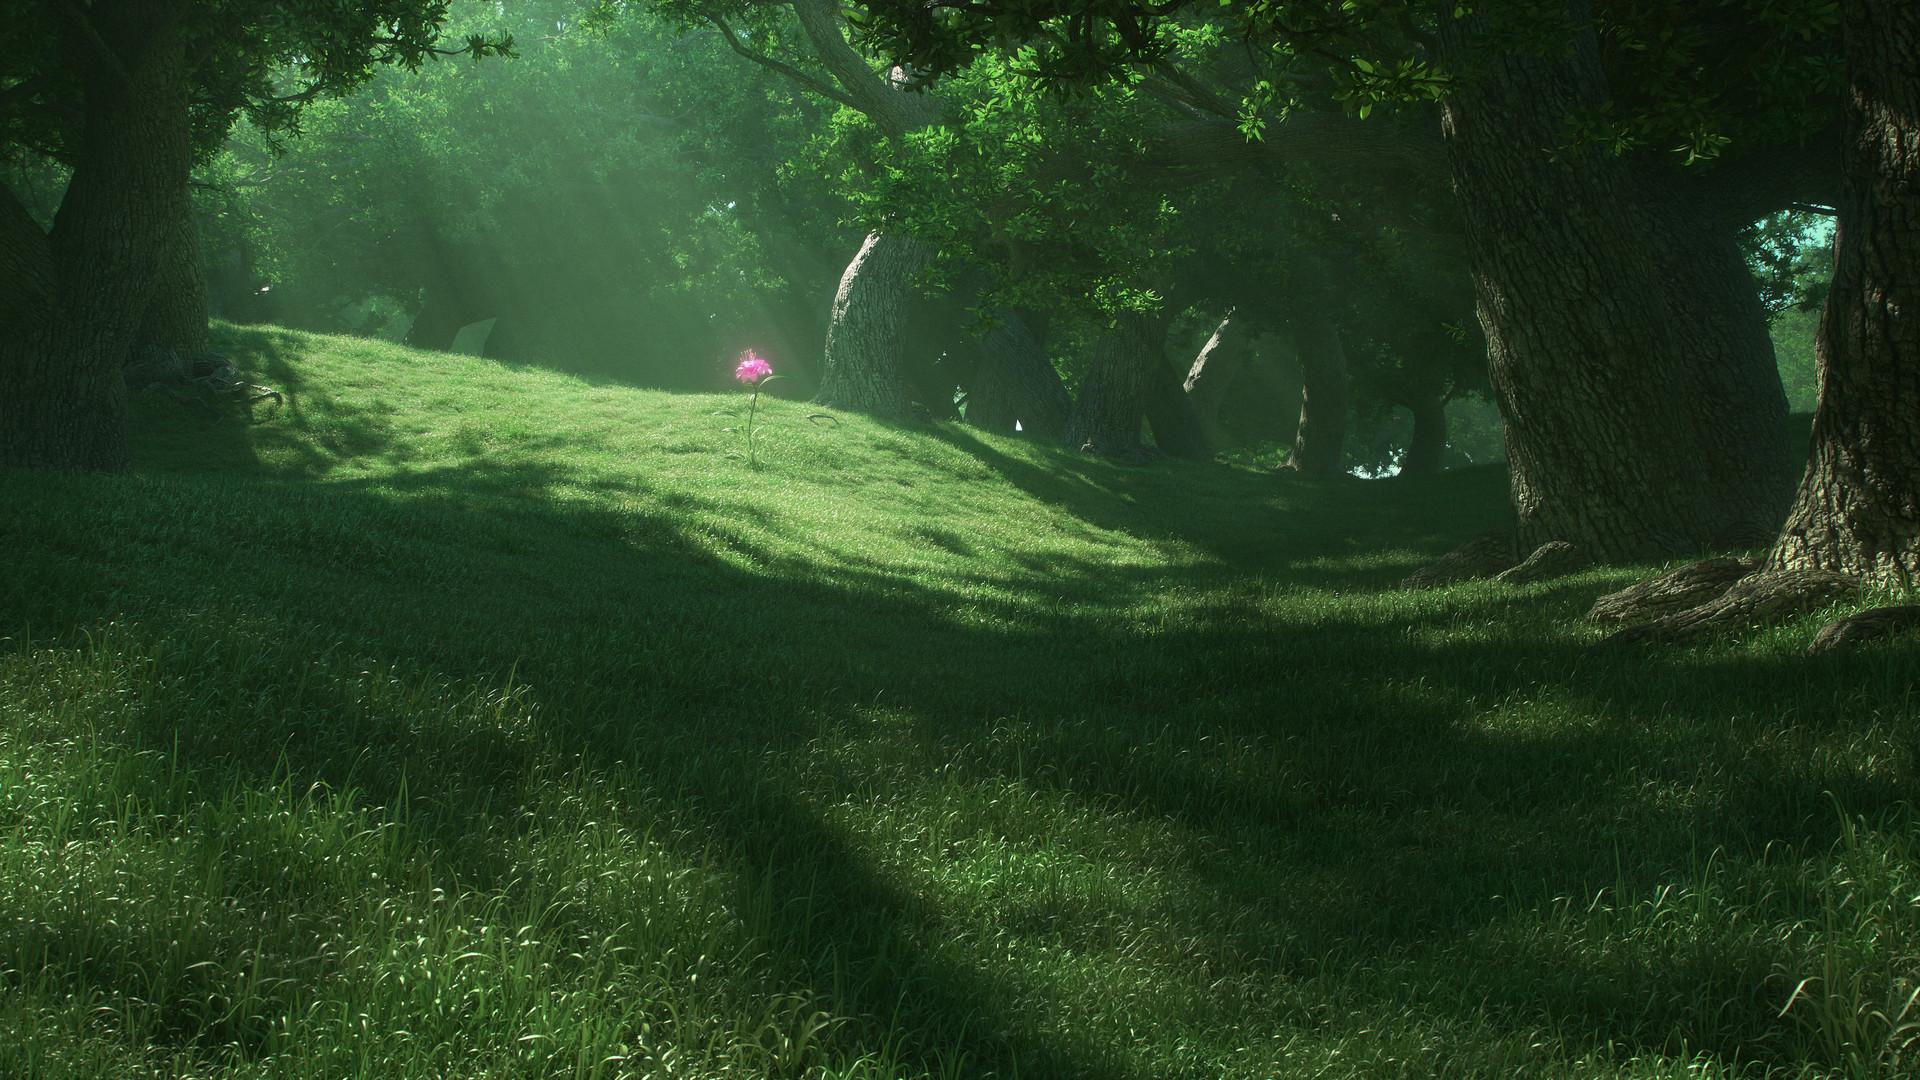 ArtStation - Magic forest - Rendin, LK (Lord-Kvento)